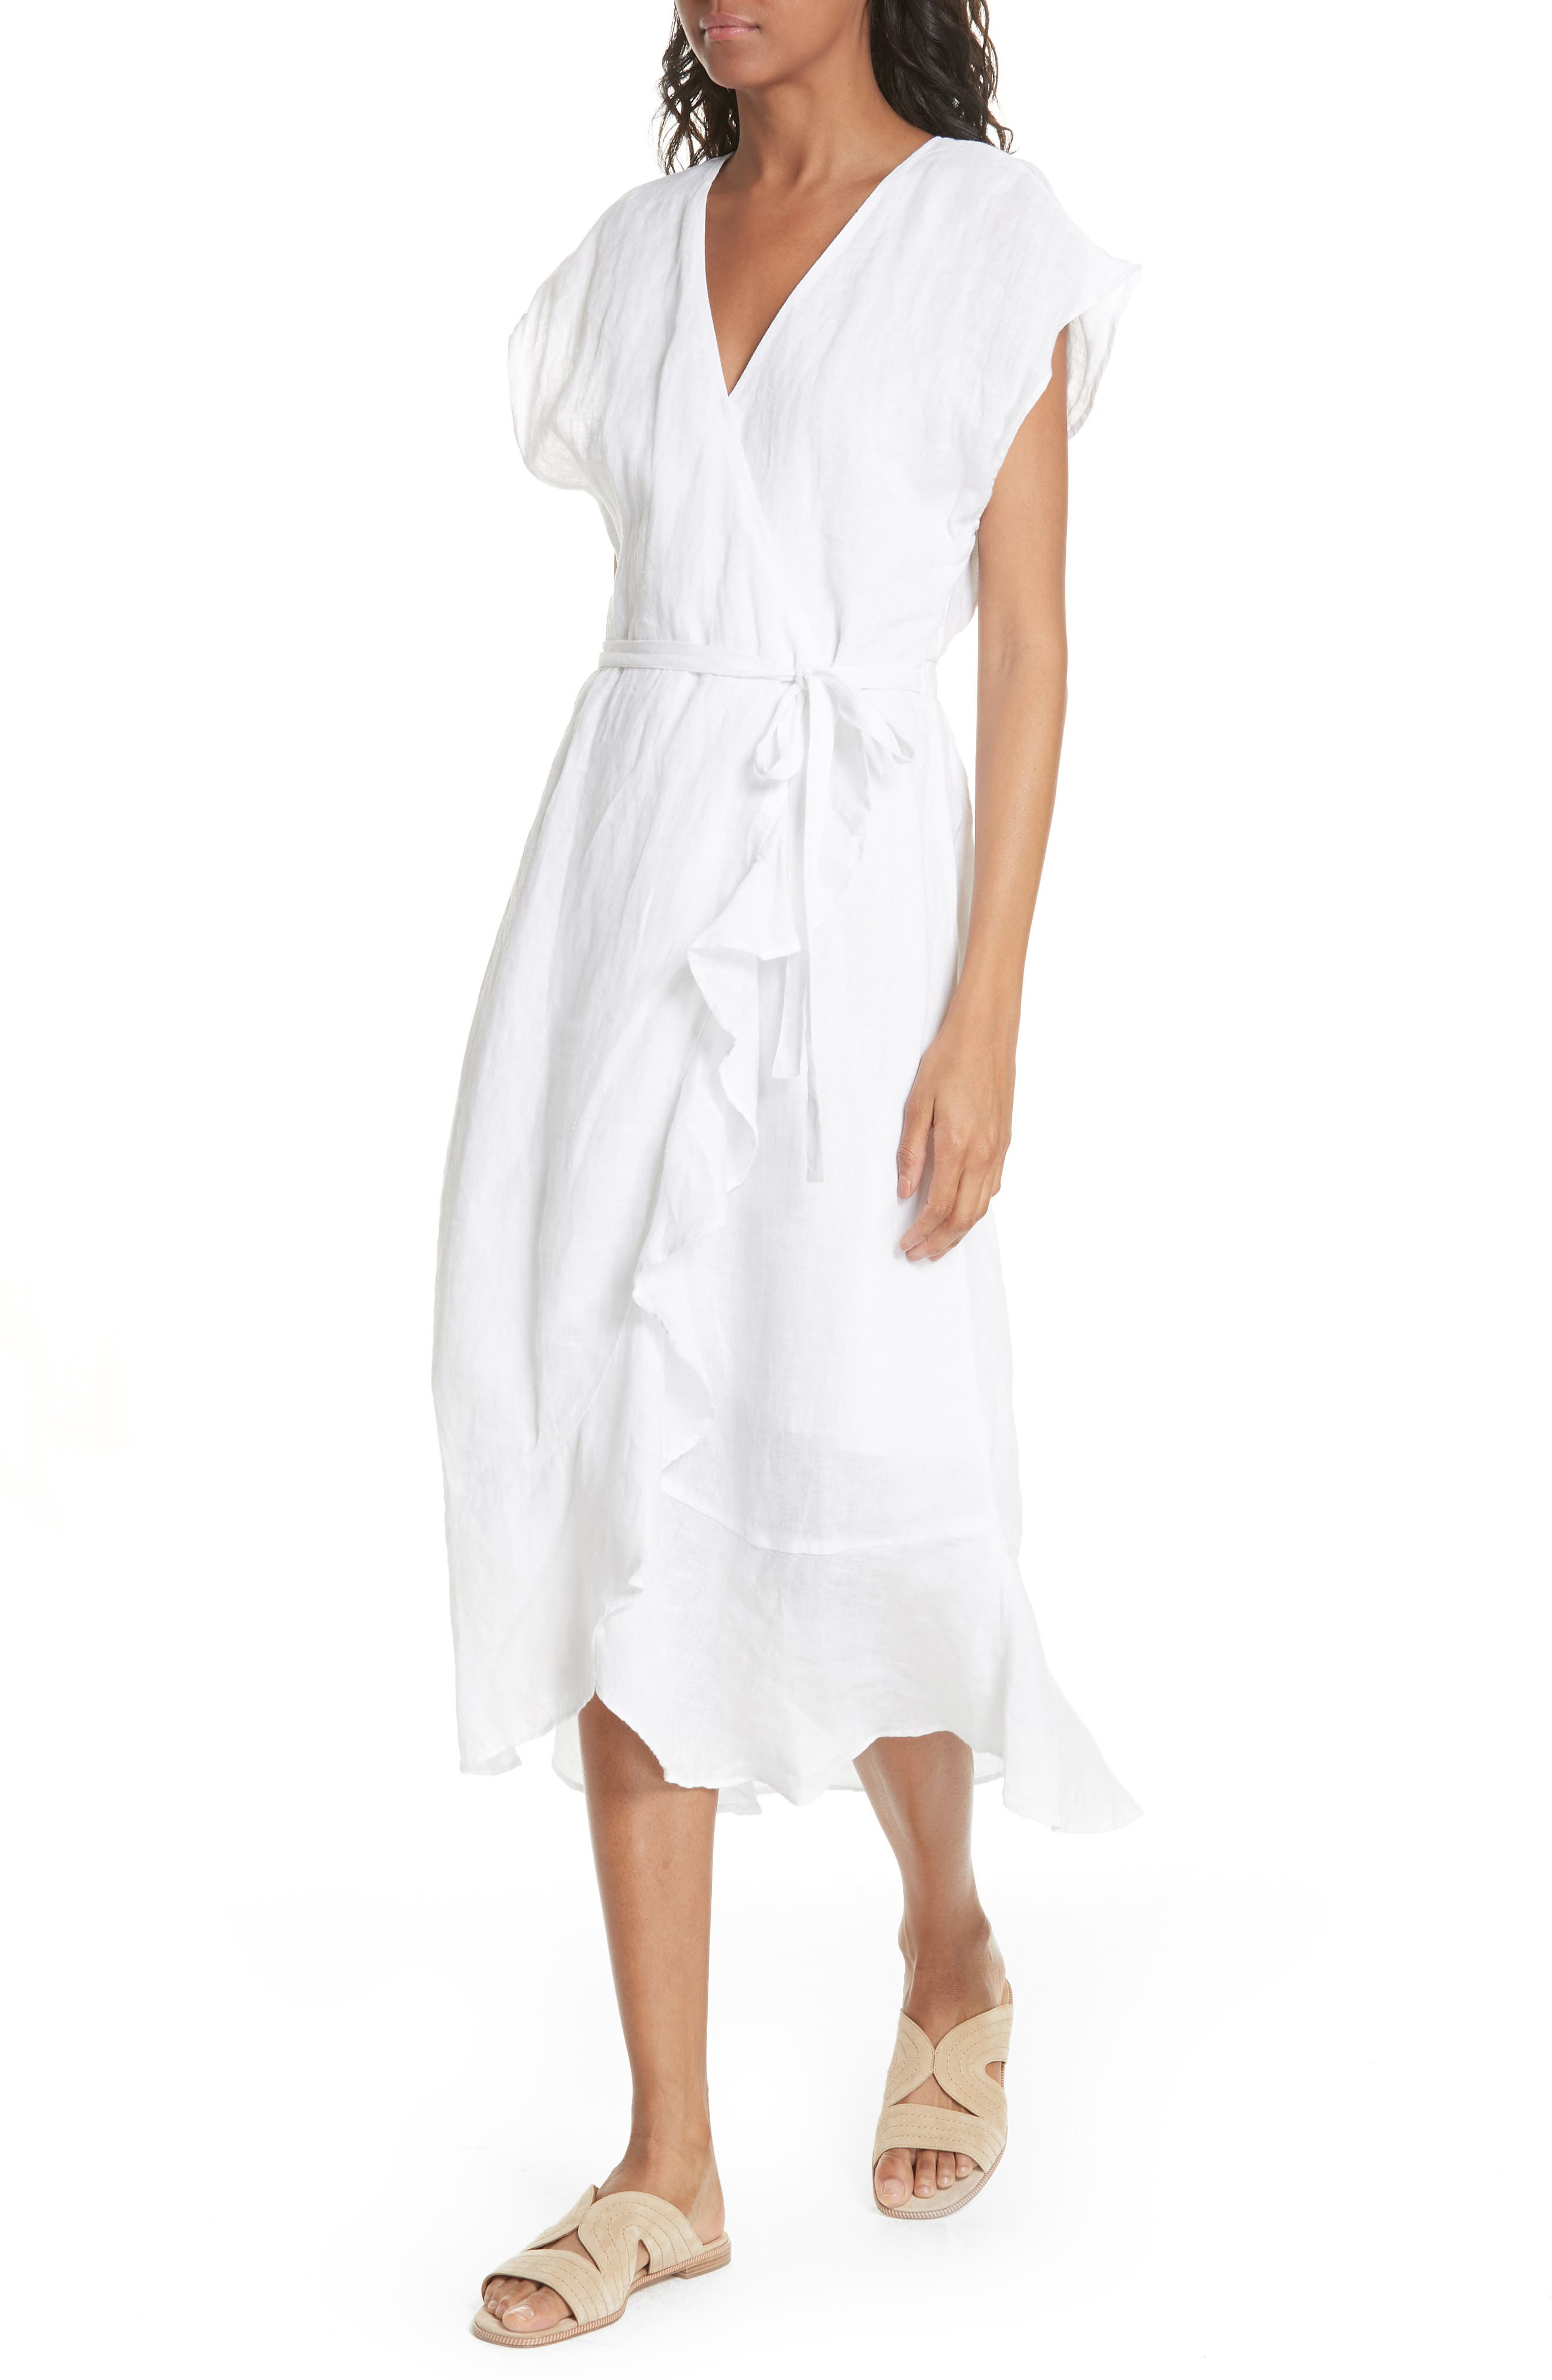 Filma Back Cutout Linen Wrap Dress,                             Alternate thumbnail 4, color,                             120